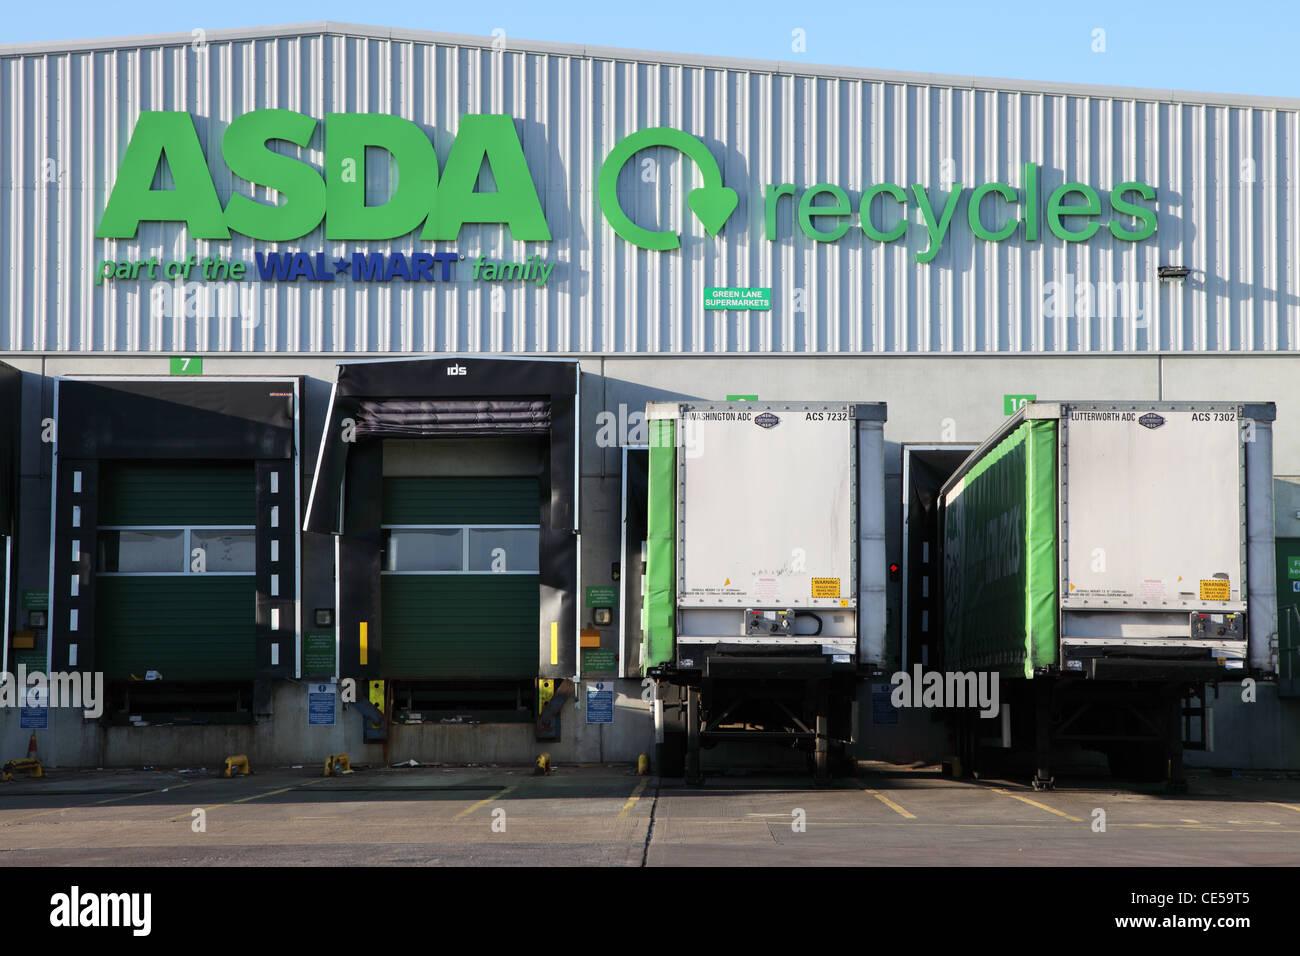 Asda Wallmart Ambient Distribution Centre Washington north east England UK - Stock Image